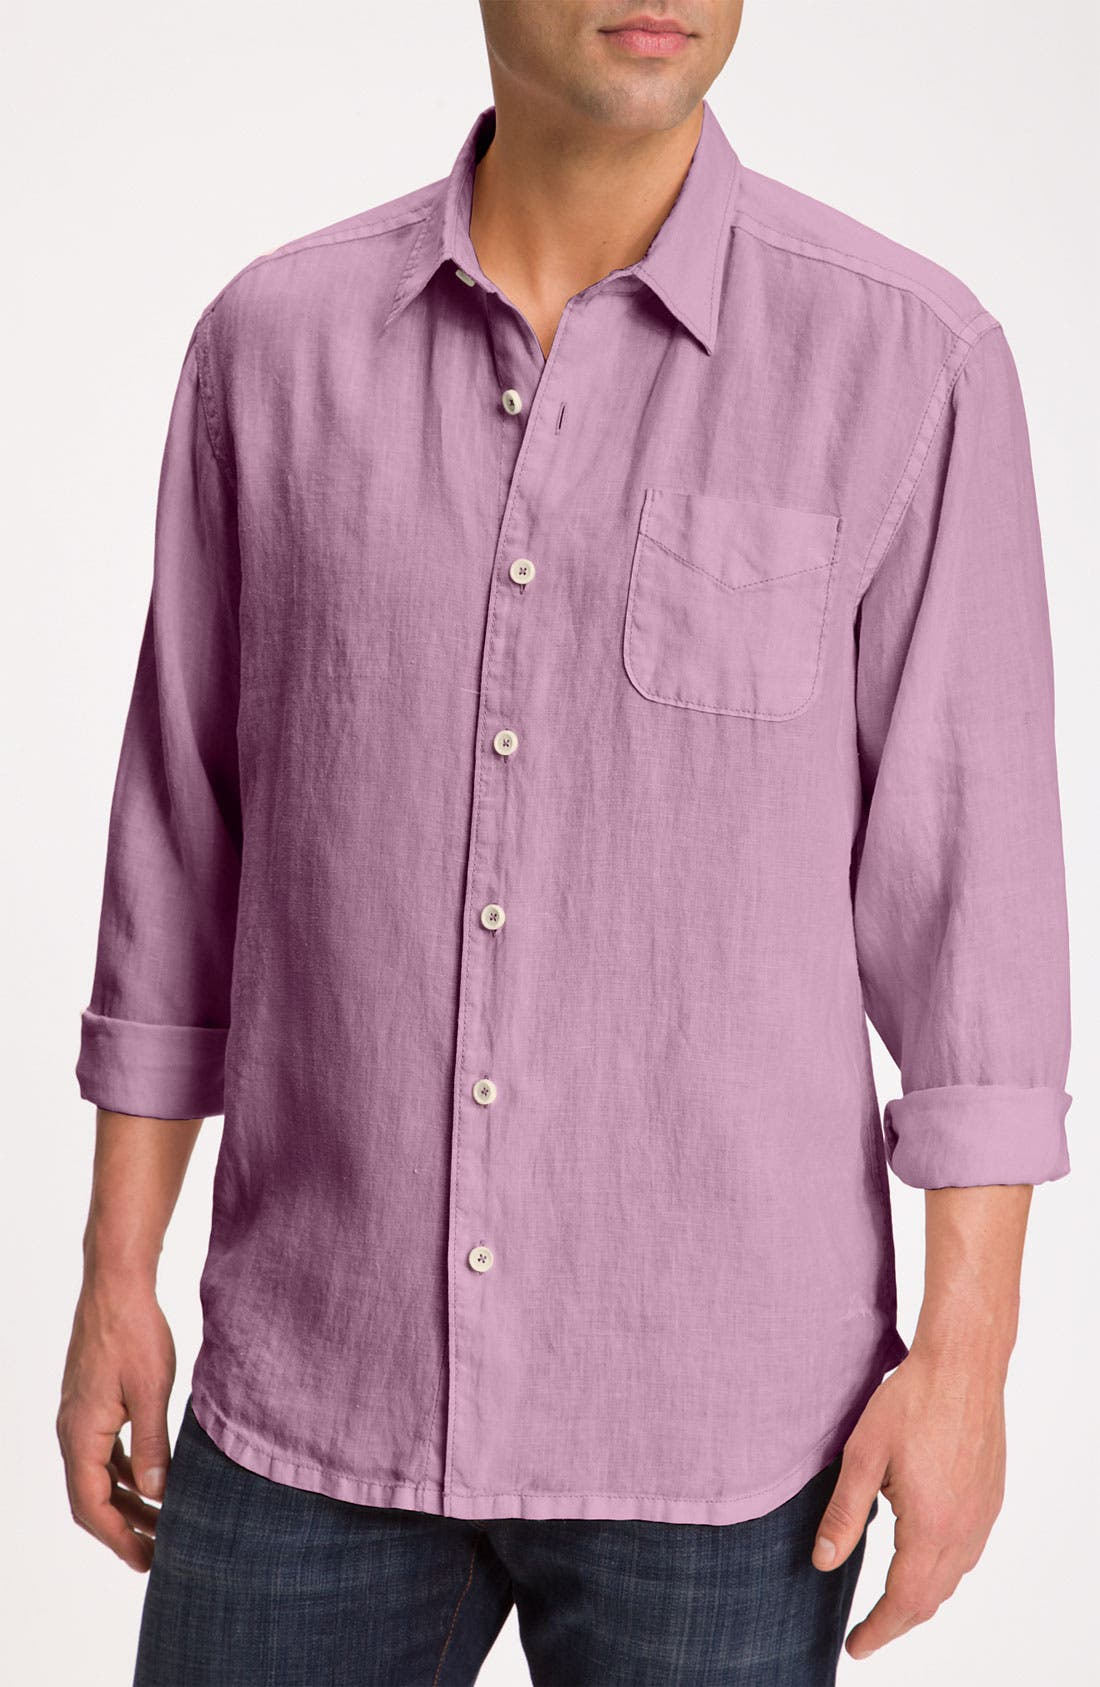 Alternate Image 1 Selected - Tommy Bahama 'Beachy Breezer' Linen Sport Shirt